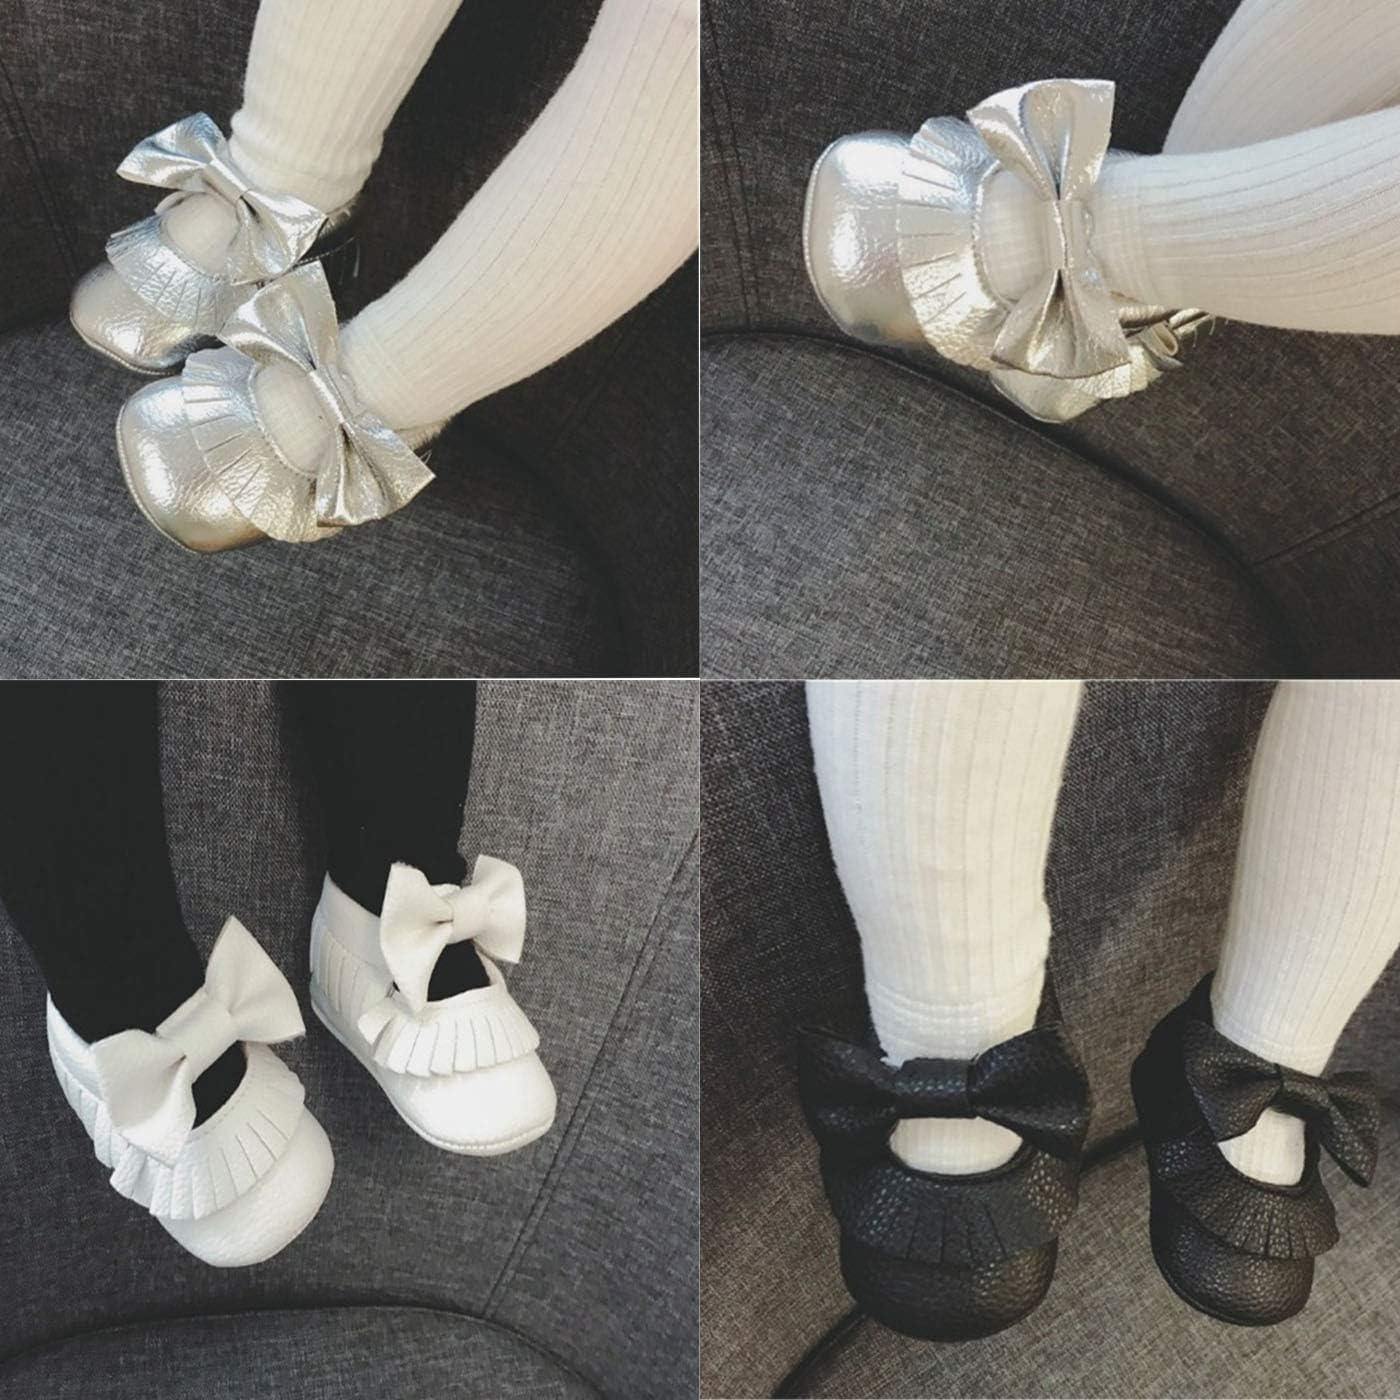 ENERCAKE Toddler Baby Boys Girls Shoes Non Slips Slipper Sneaker Moccasins Infant First Crib Walker House Shoes